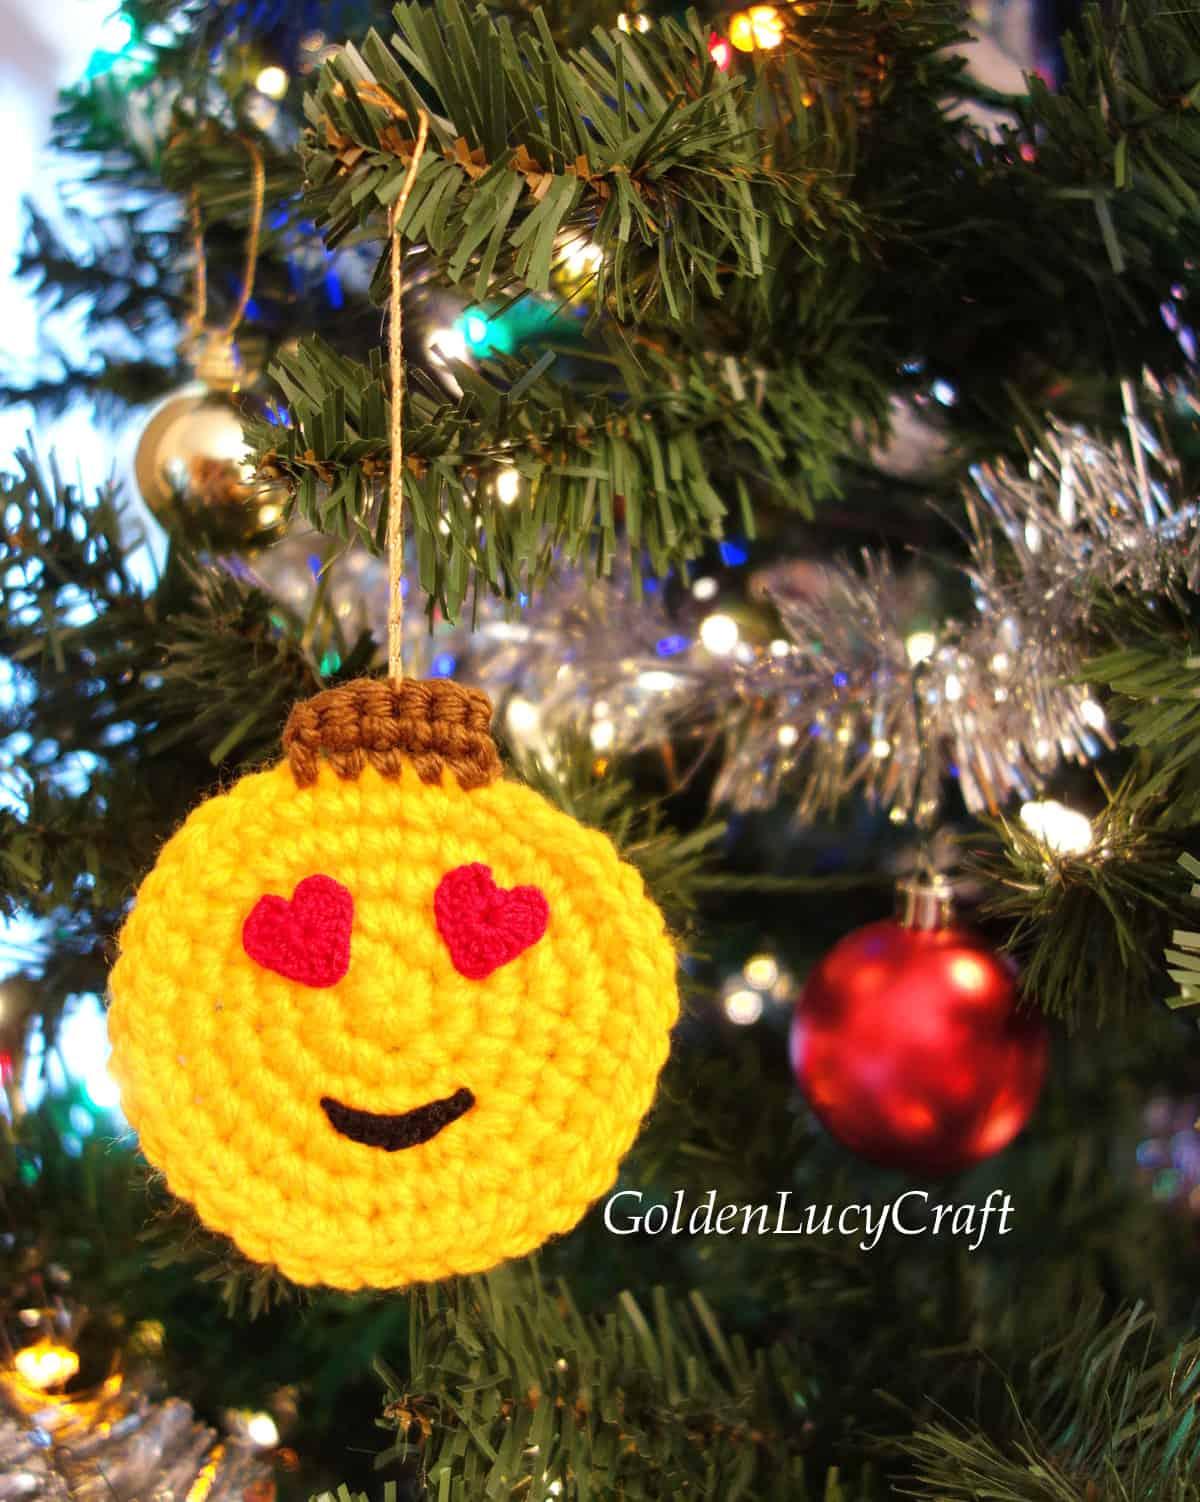 Crochet heart eyes emoji Christmas ornament hanging on the Christmas tree.